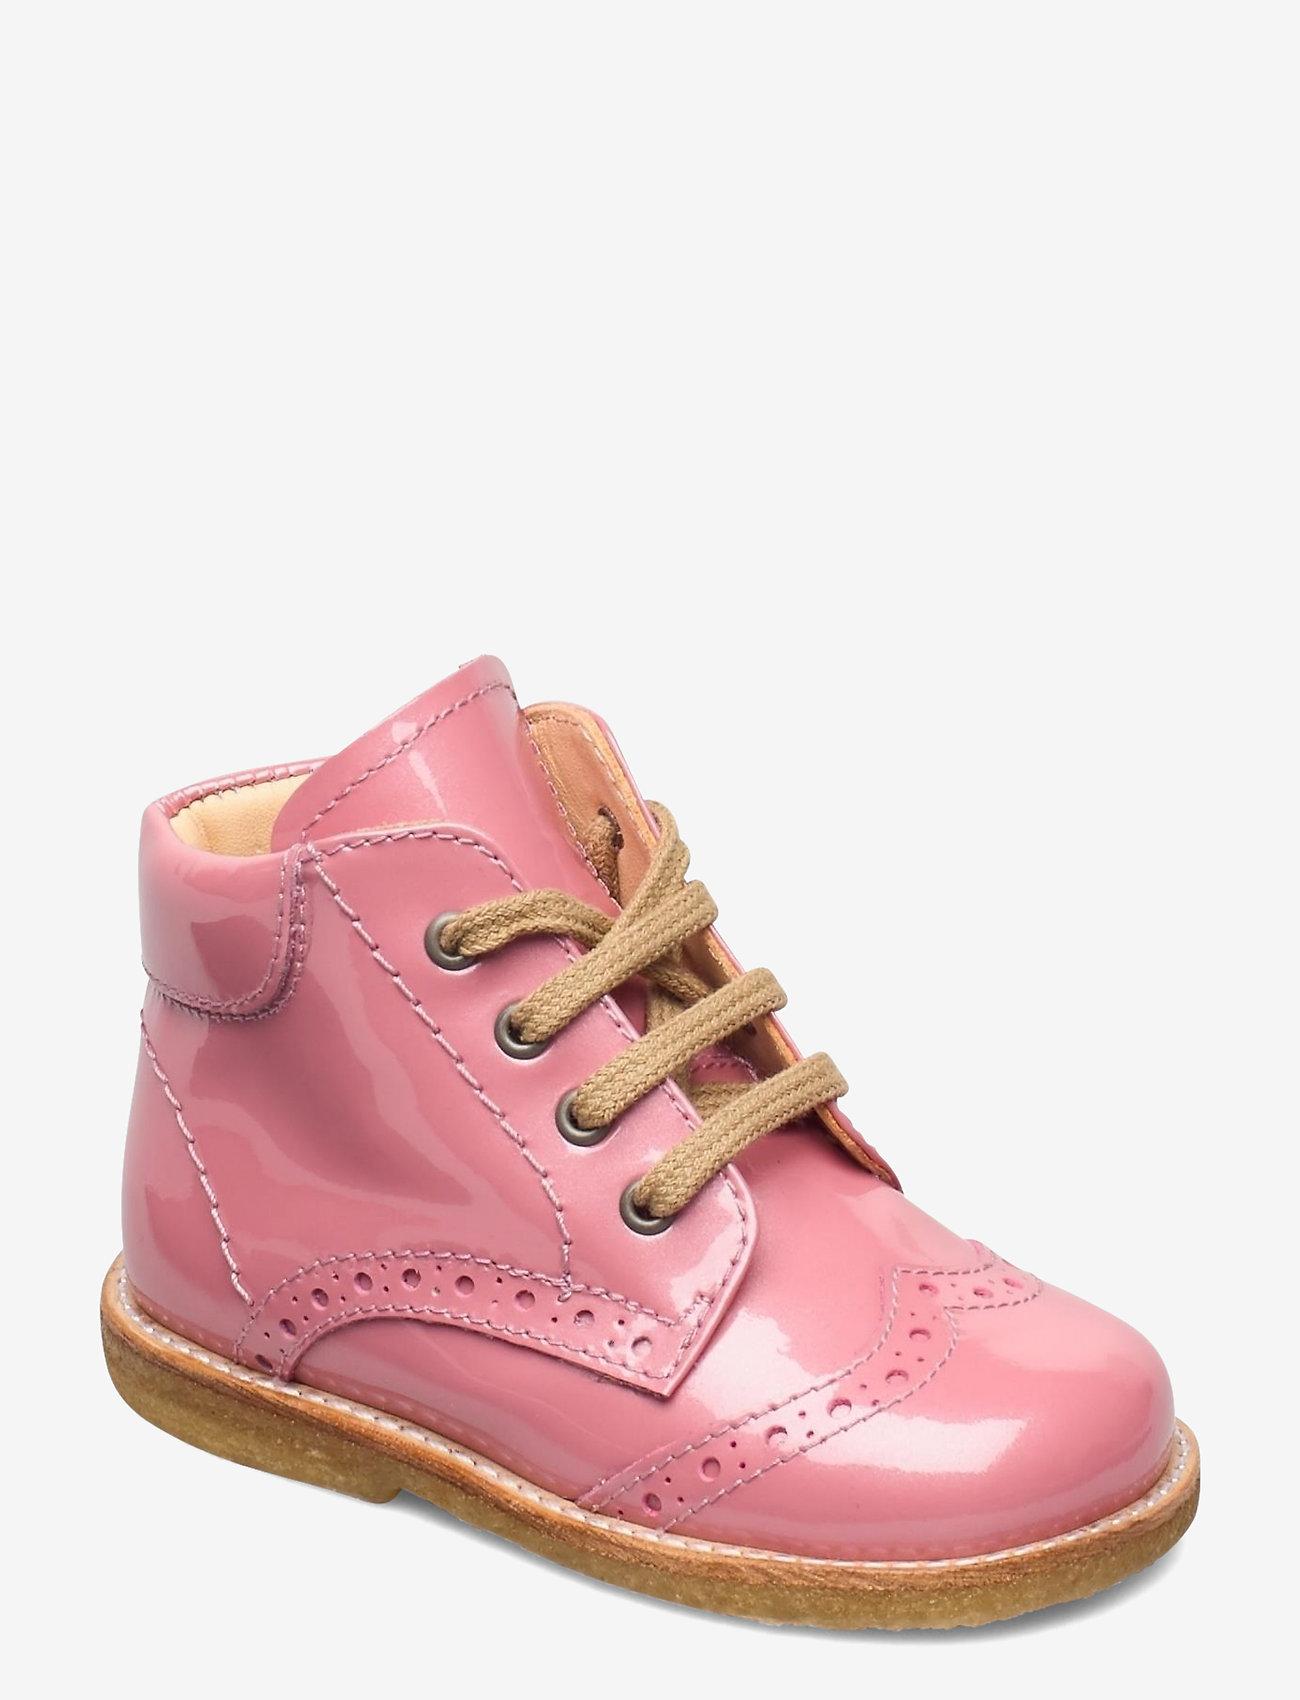 ANGULUS - Shoes - flat - with lace - lauflernschuhe - 2389 rose pink - 0